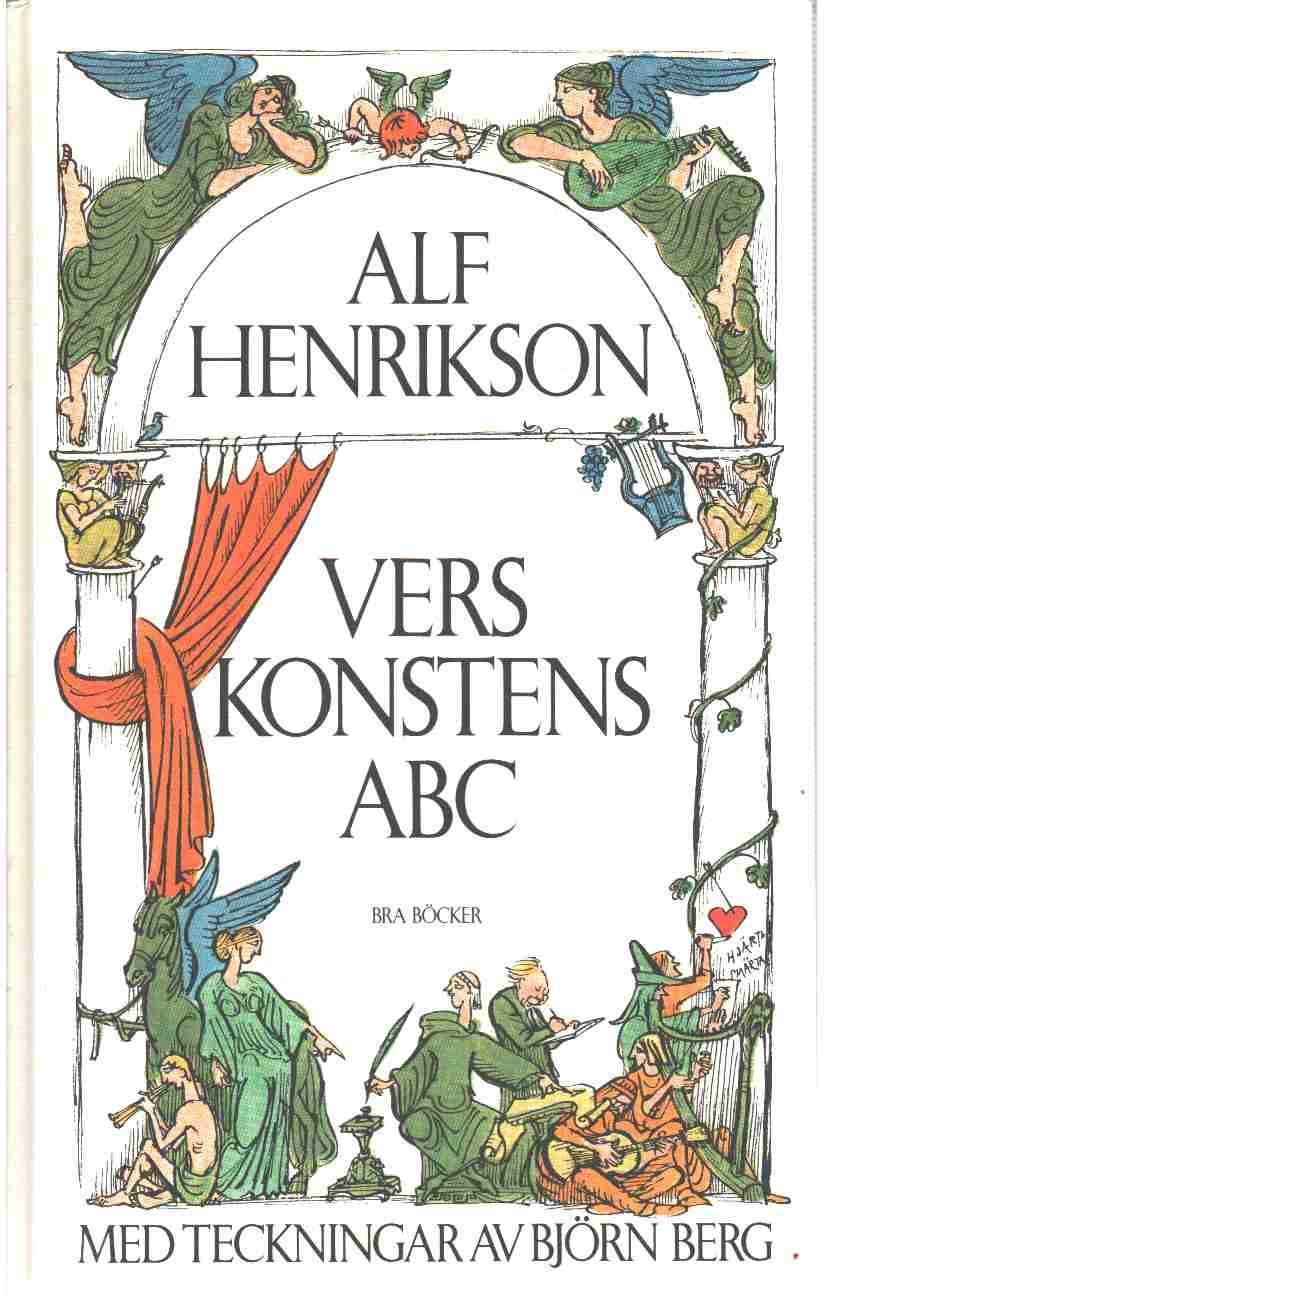 Verskonstens ABC : en poetisk uppslagsbok - Henrikson, Alf